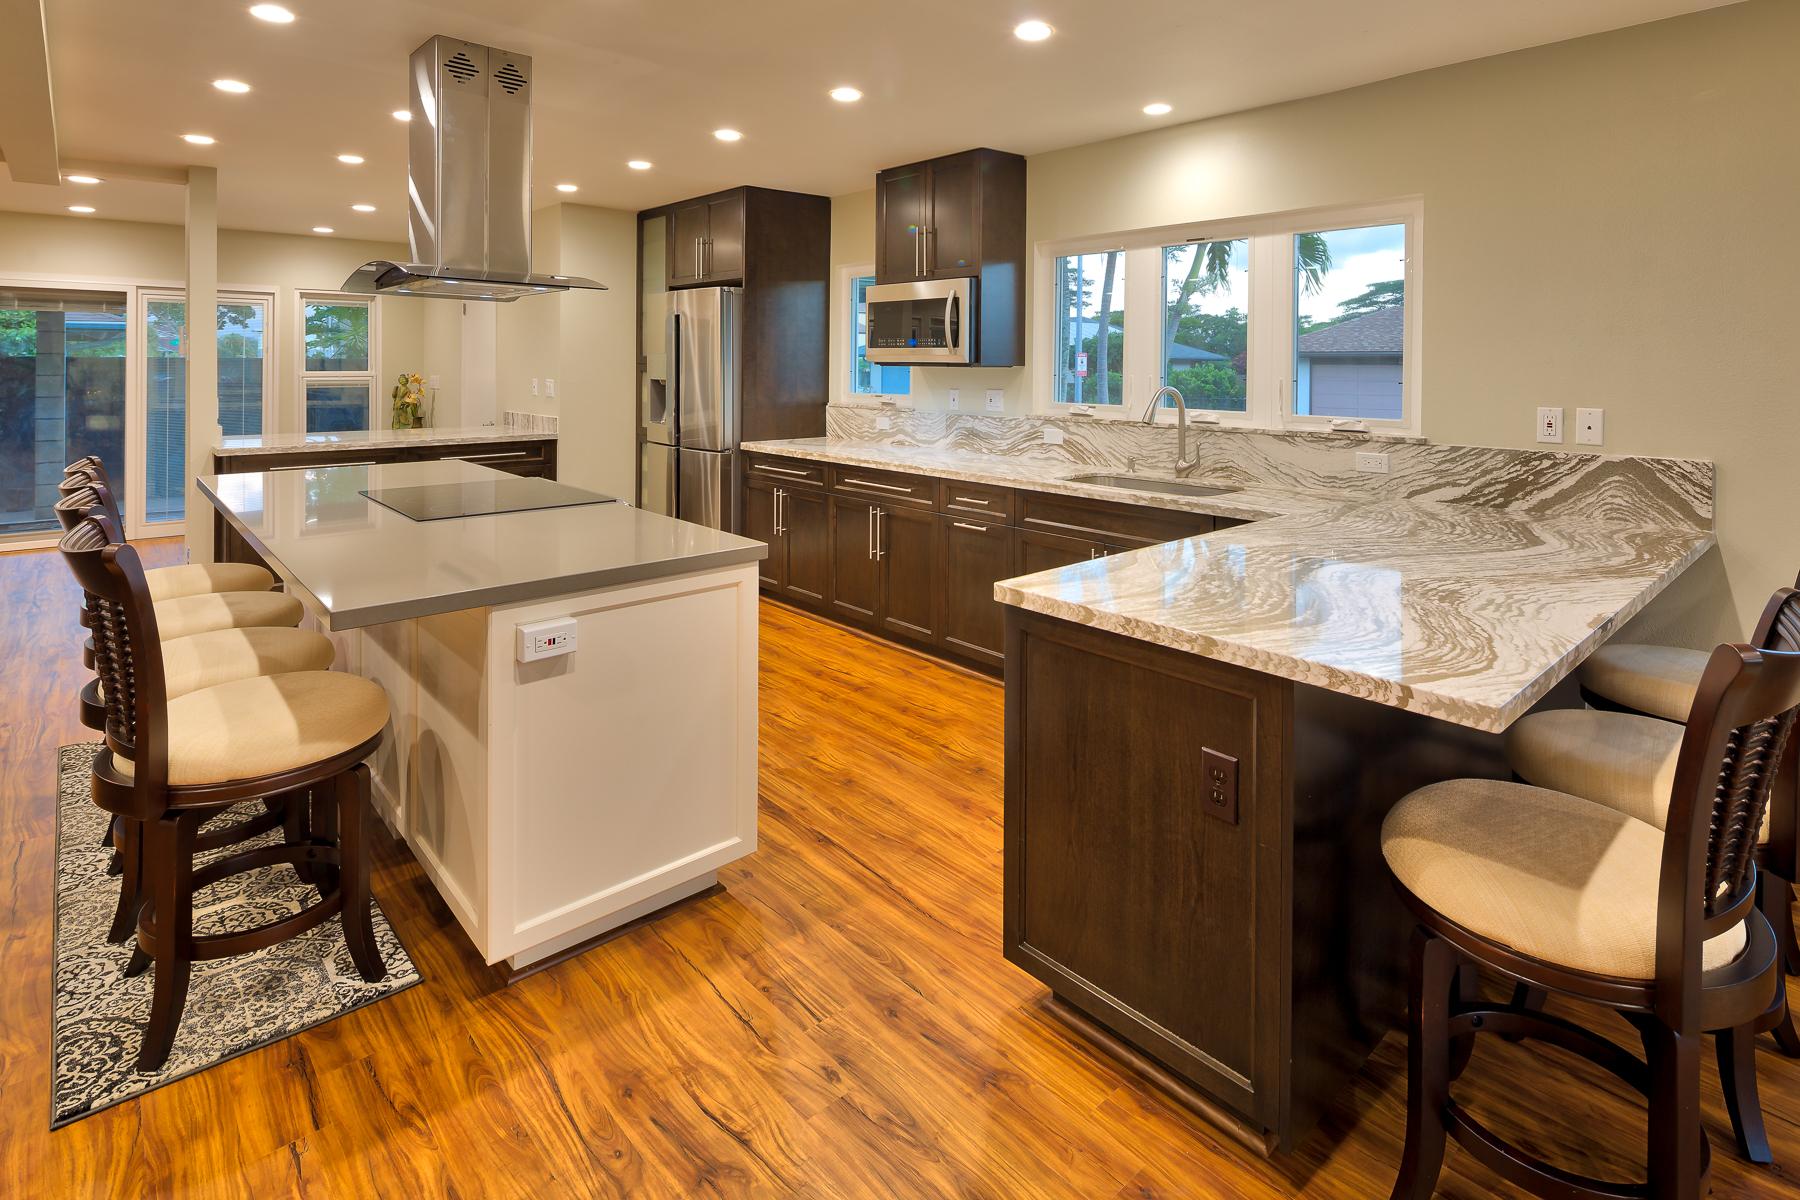 kitchen remodel hawaii purple rugs washable mililani residence home renovation remodeling honolulu